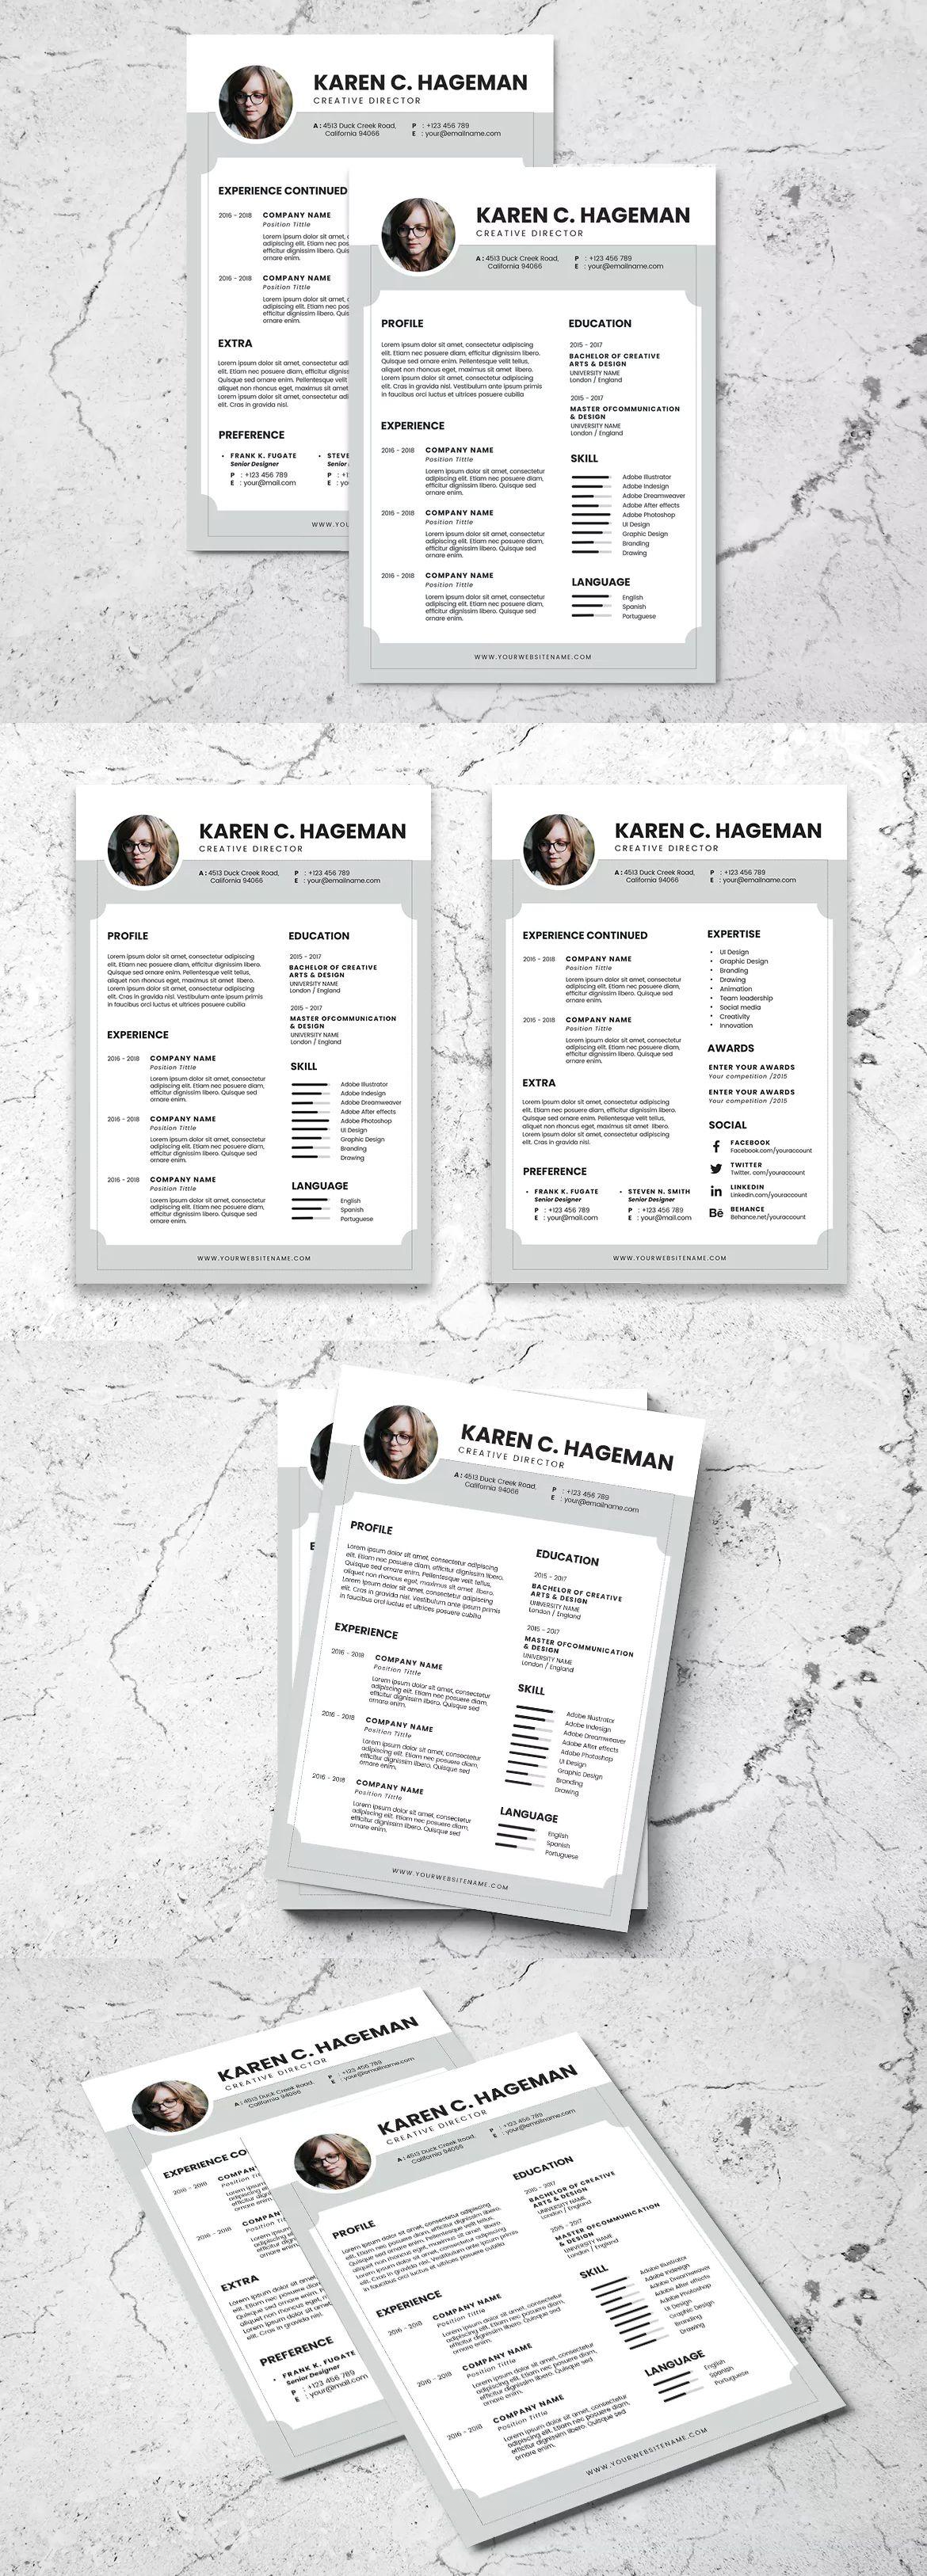 Minimalist Resume Template Psd Free Download